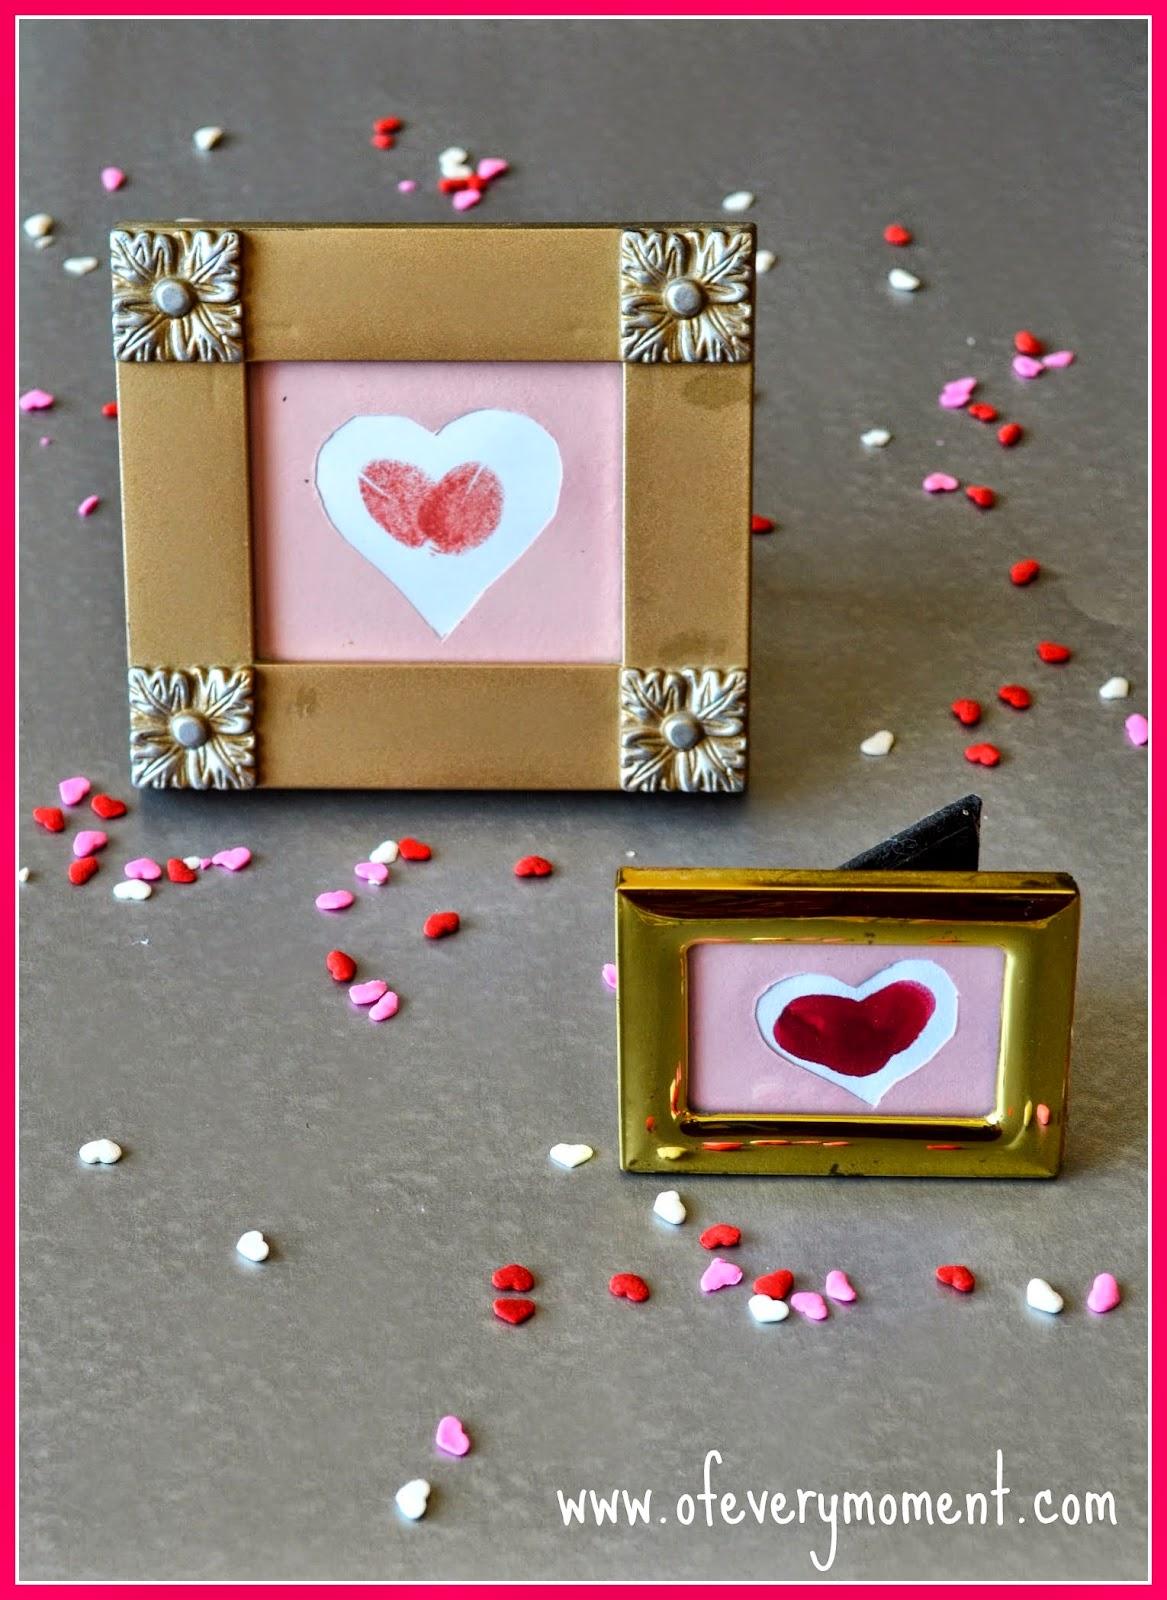 thumbprint art, framed hearts